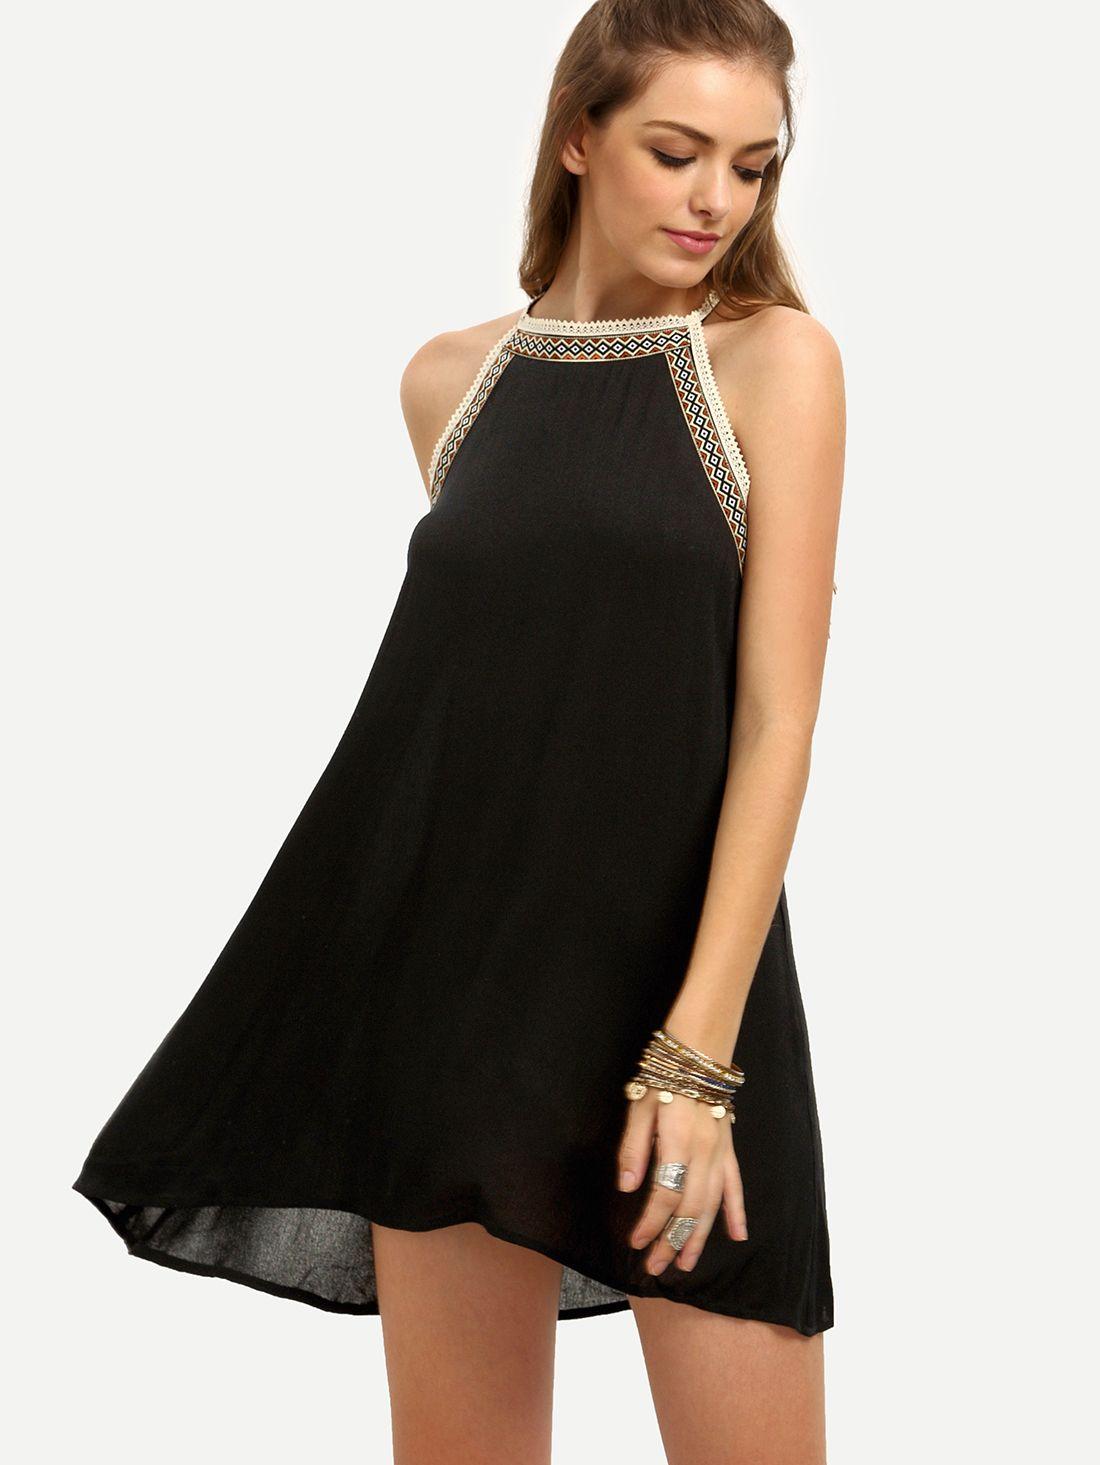 Black Crew Neck Sleeveless Shift Dress Sleeveless Shift Dress Womens Trendy Dresses Shift Dress [ 1465 x 1100 Pixel ]